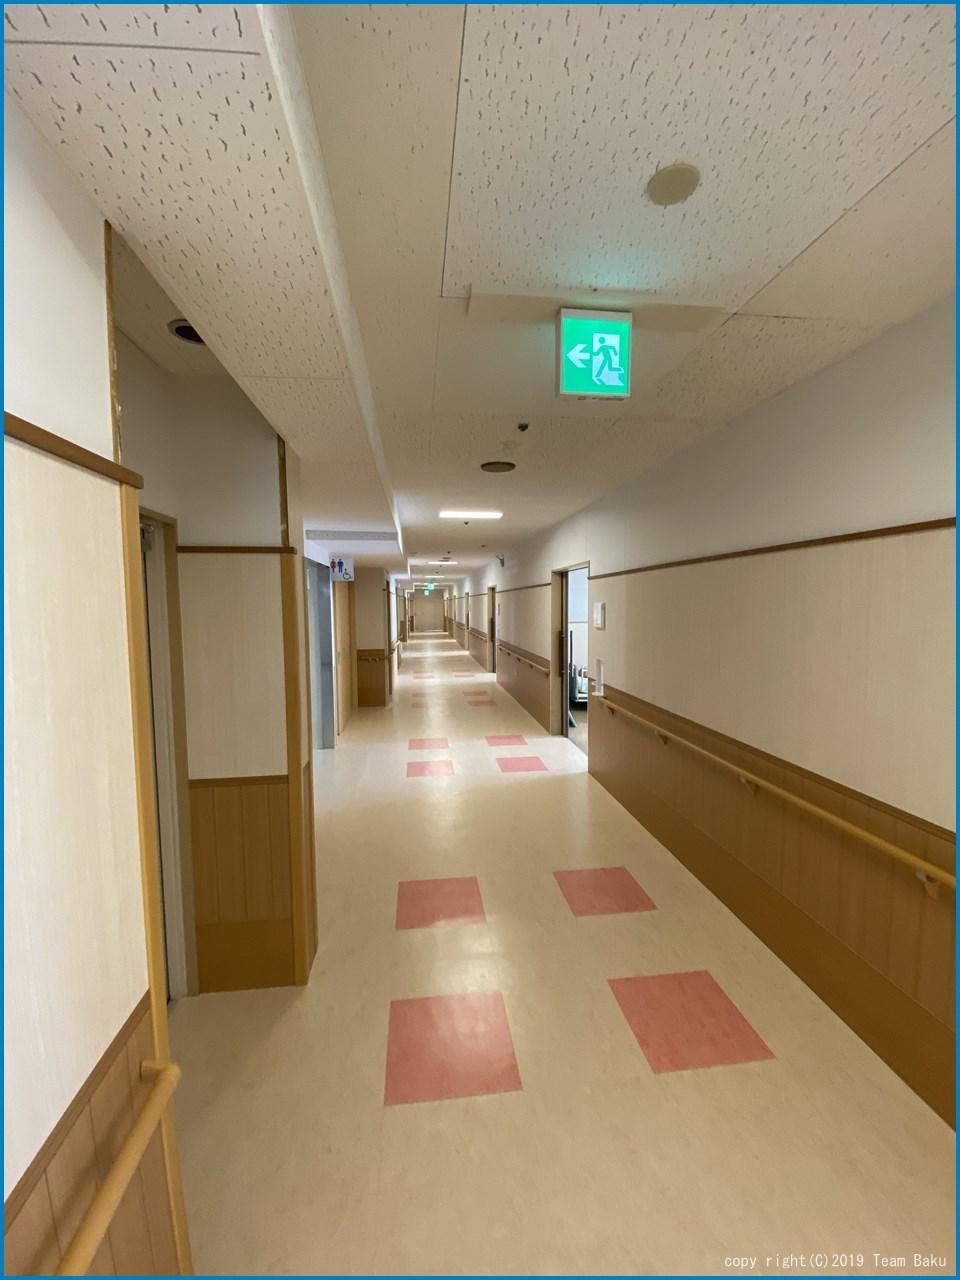 N病院グループ Nナーシング南館 改修・増築工事 4_c0376508_18053744.jpg